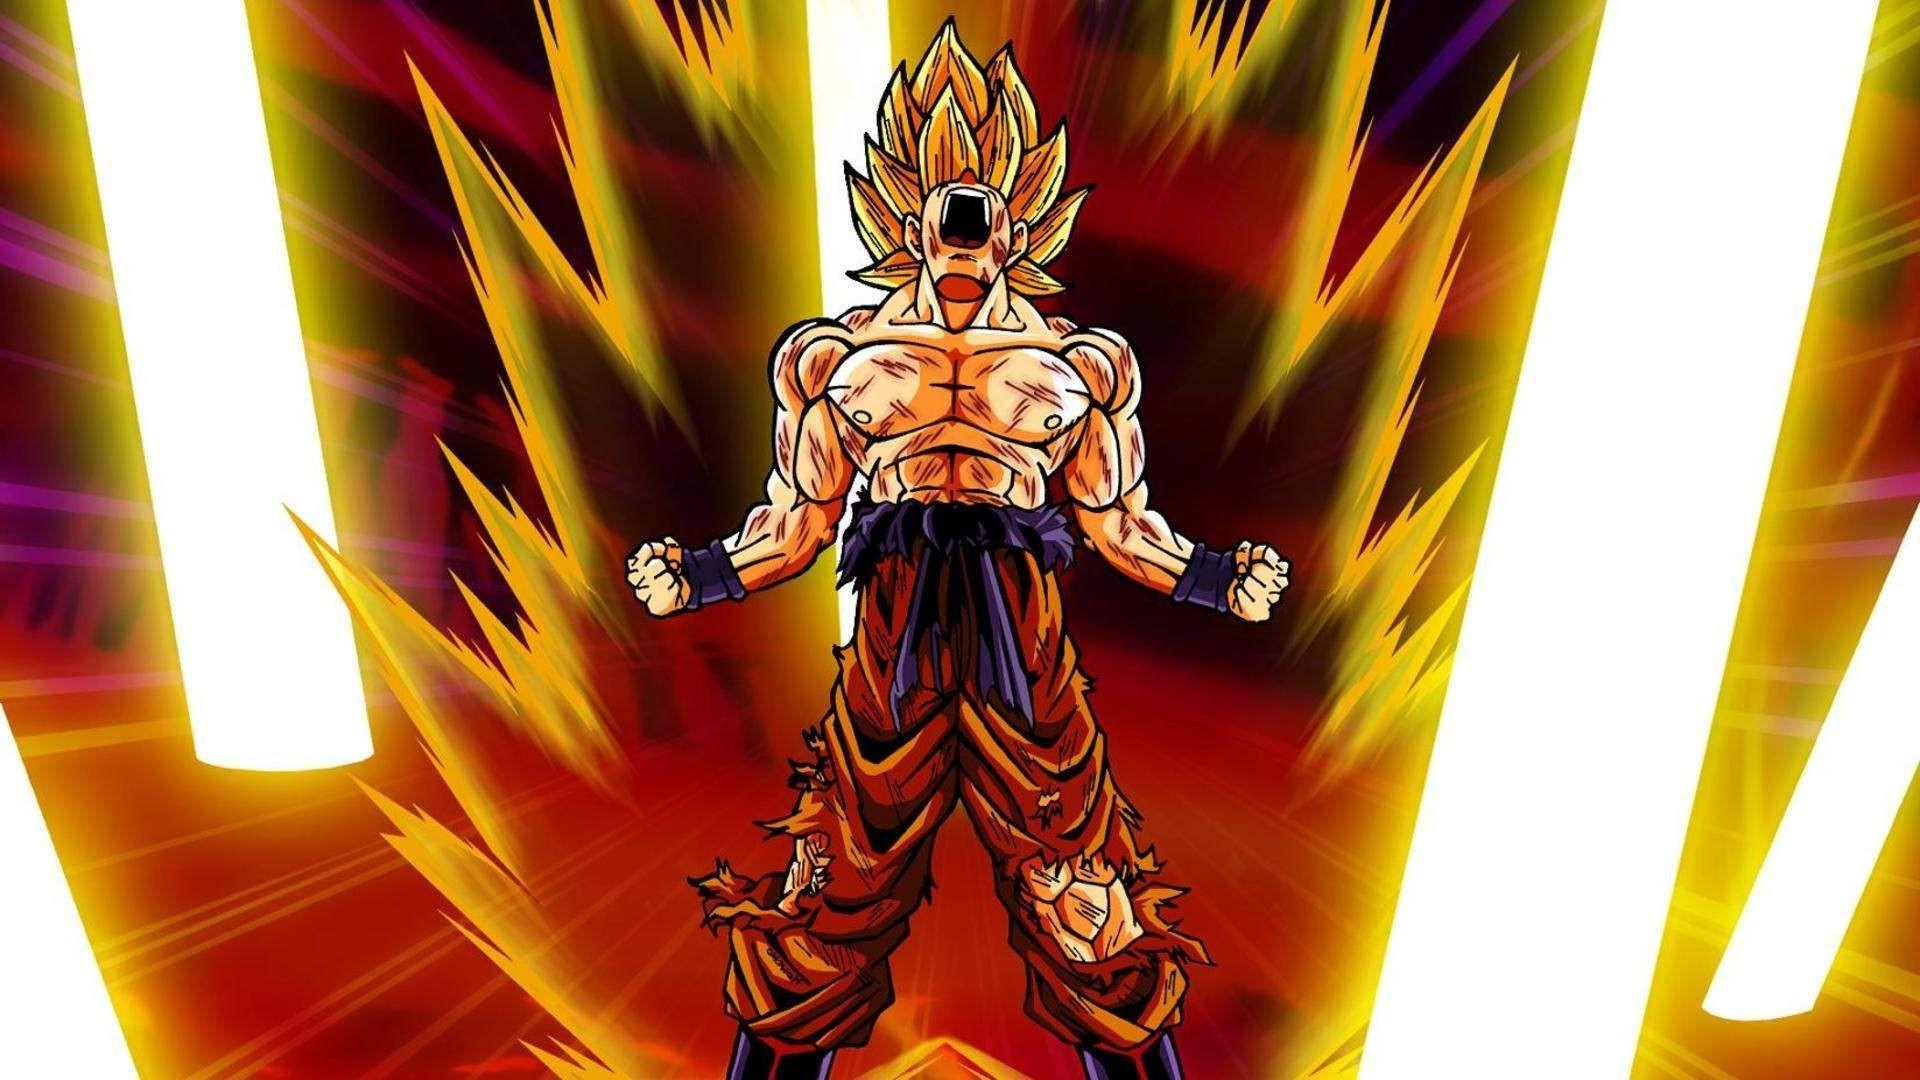 Dragon Ball Z Goku Wallpapers High Quality Download Free | HD Wallpapers |  Pinterest | Goku wallpaper, Wallpaper and Dragons